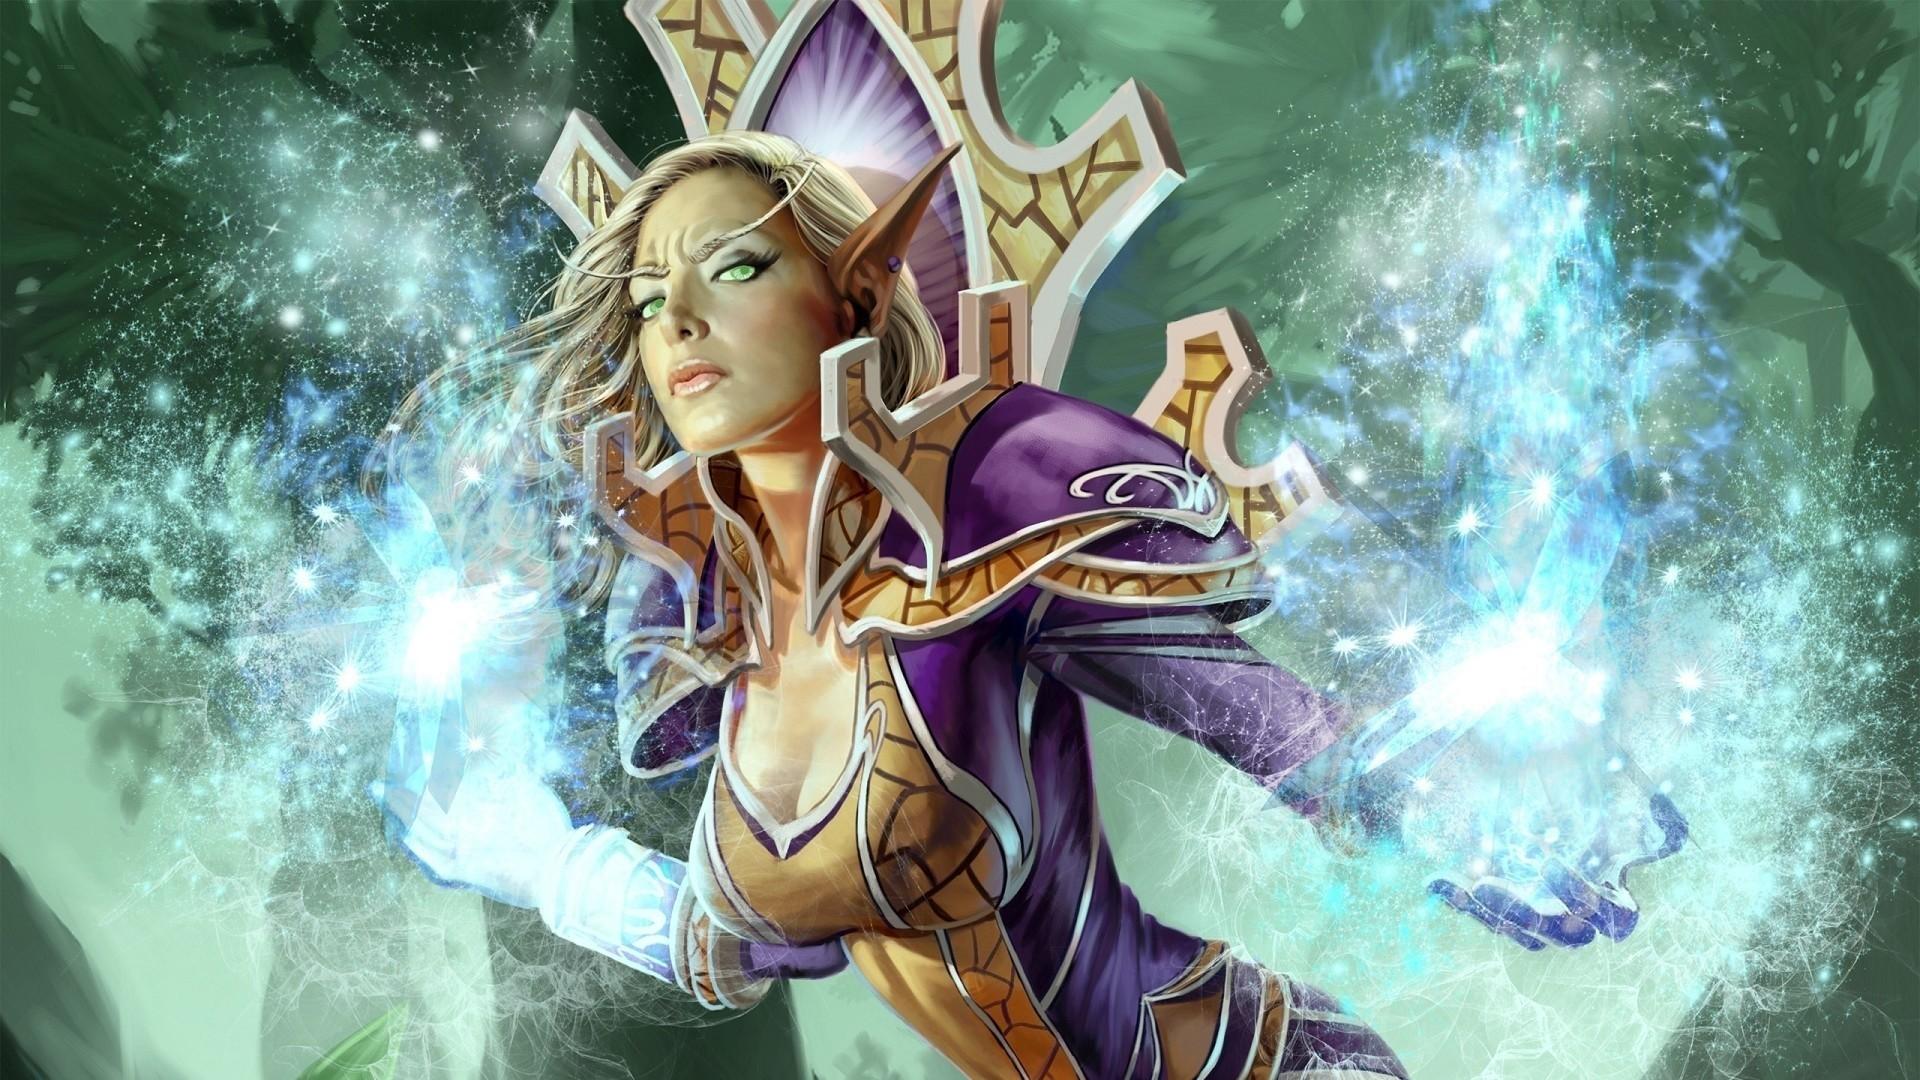 Latest World of Warcraft Wallpaper